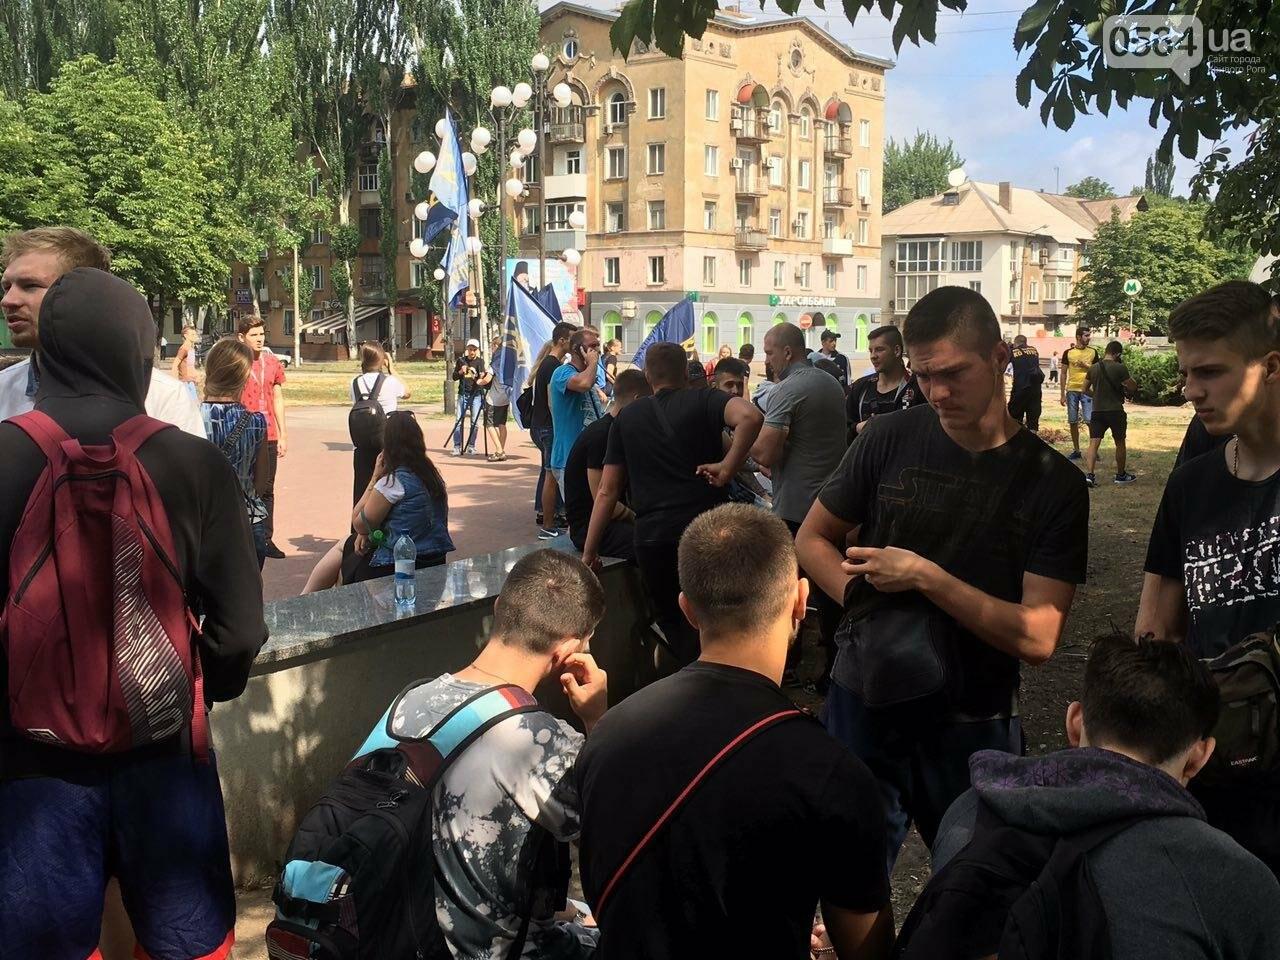 Трубят рога: В Кривом Роге собрались противники ЛГБТ-движения, - ФОТО, ВИДЕО, фото-2